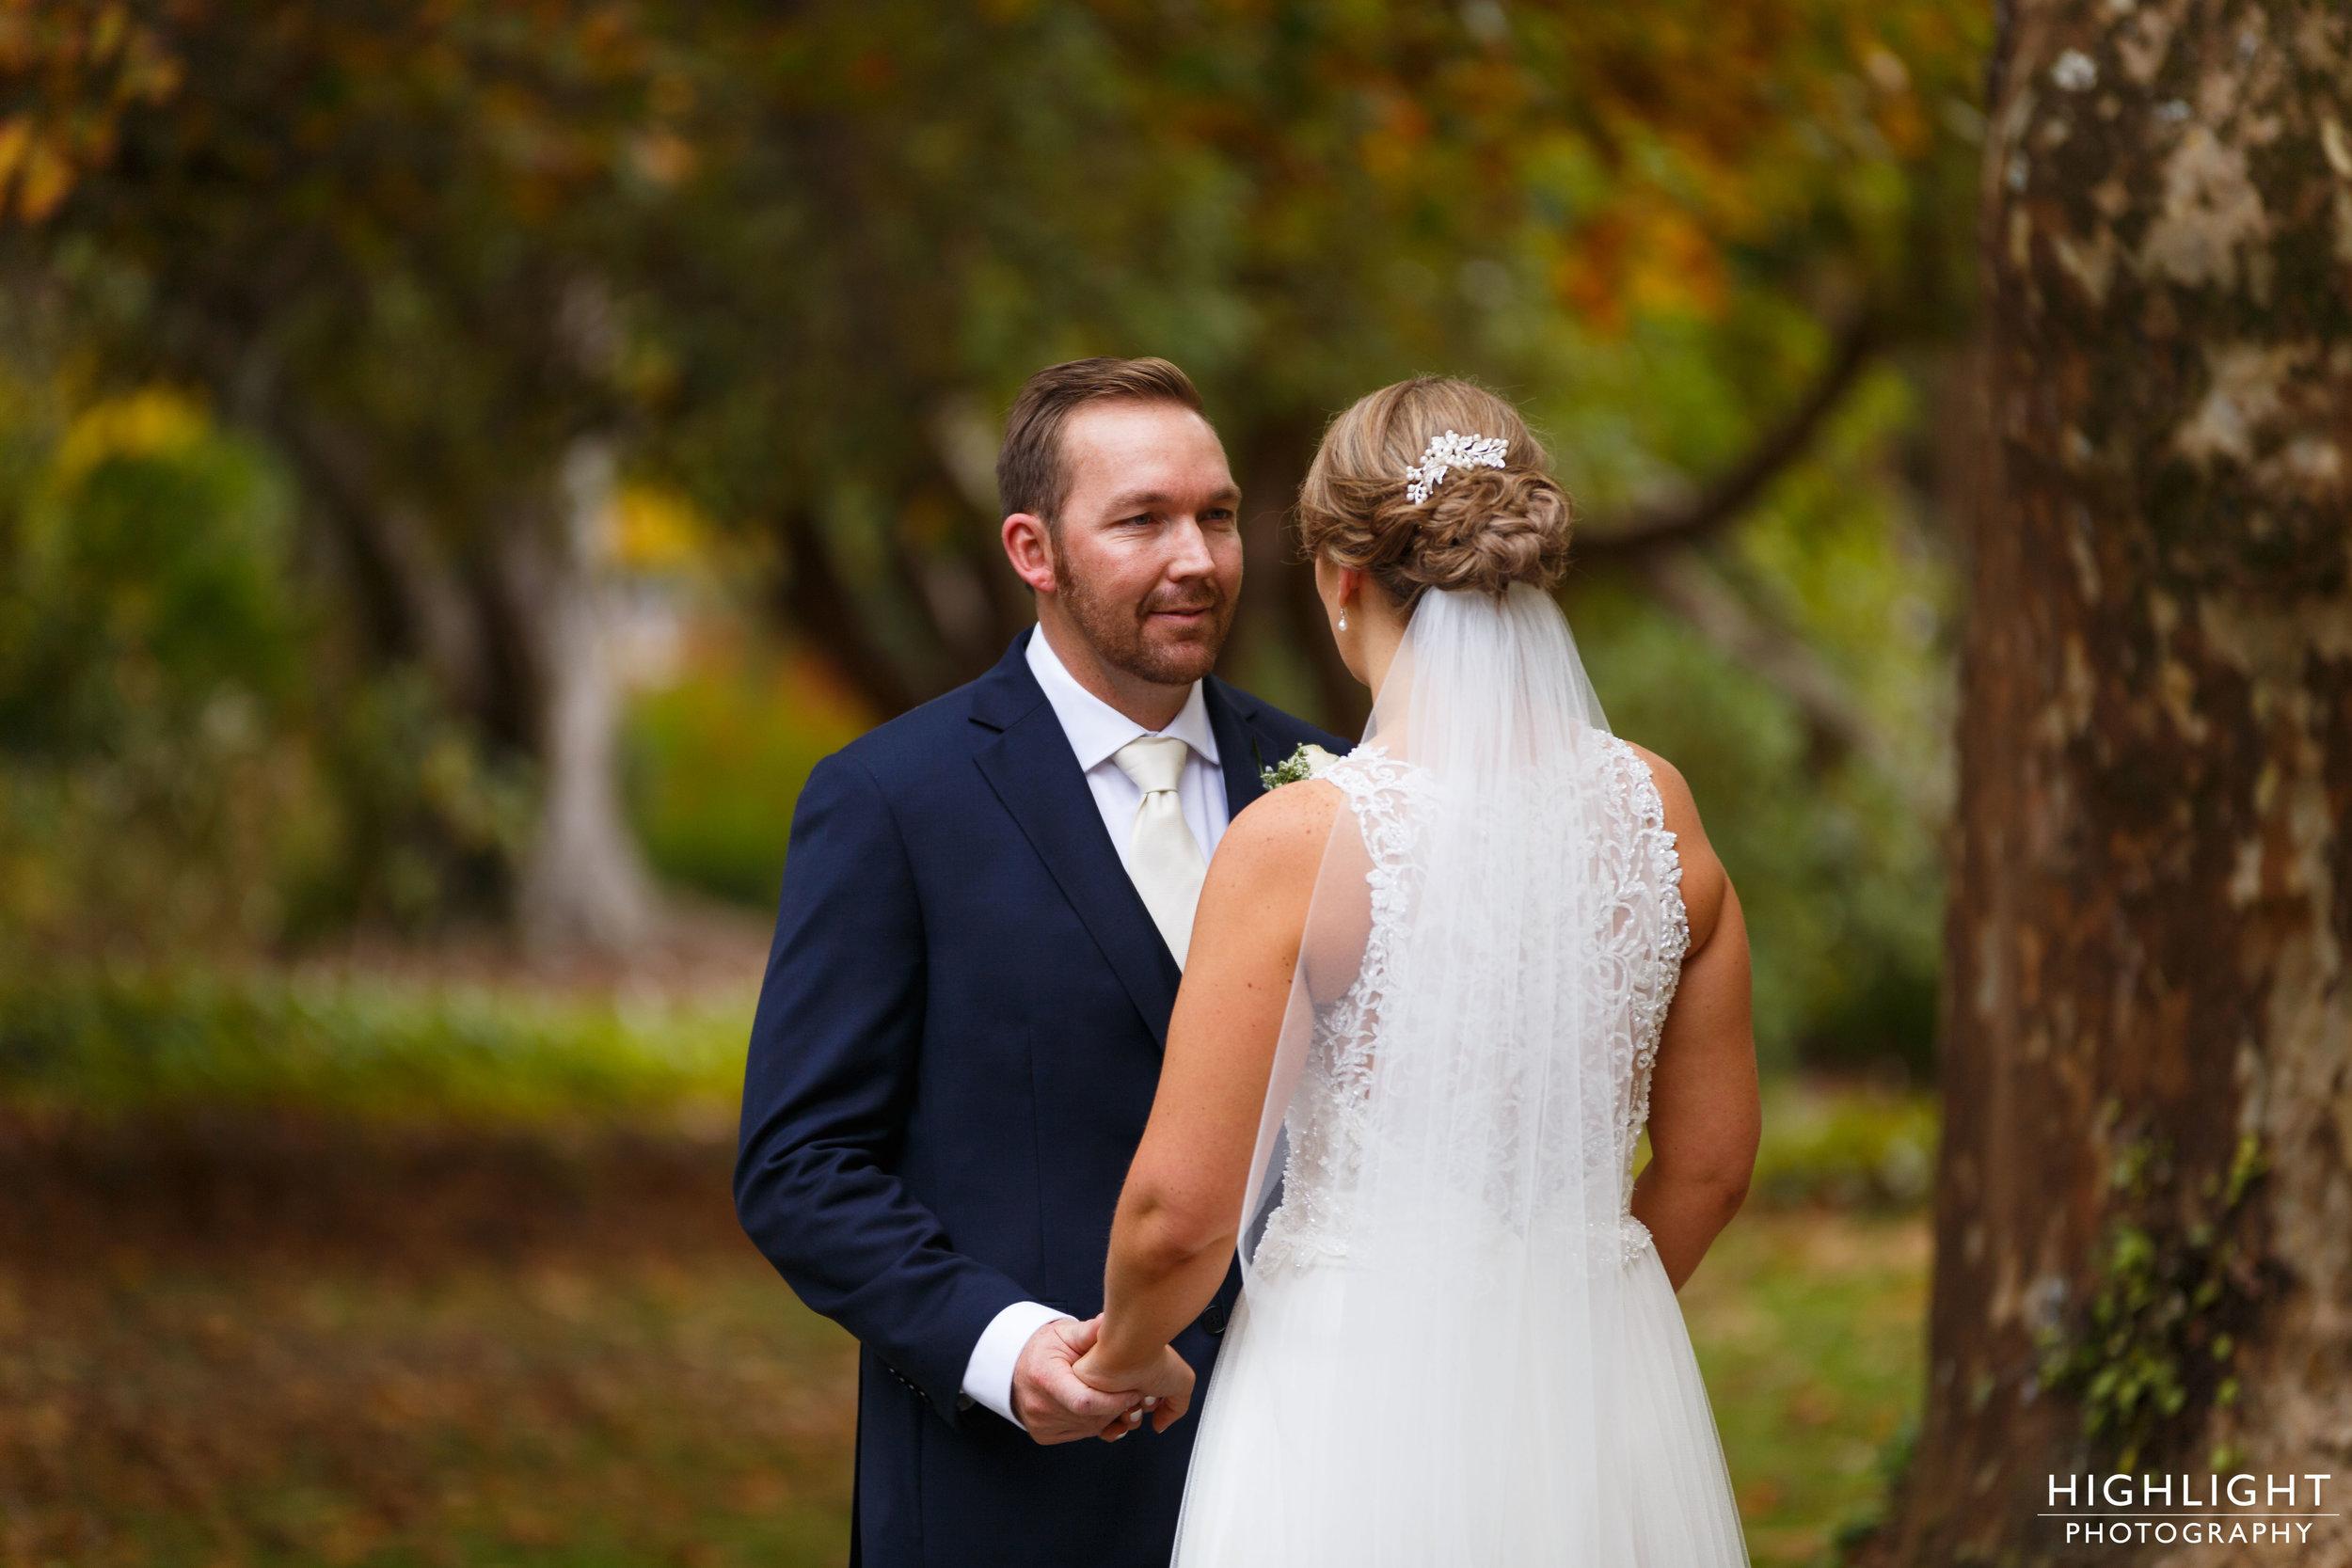 highlight-wedding-photography-palmerston-north-new-zealand-orlando-country-club-wedding-41.jpg